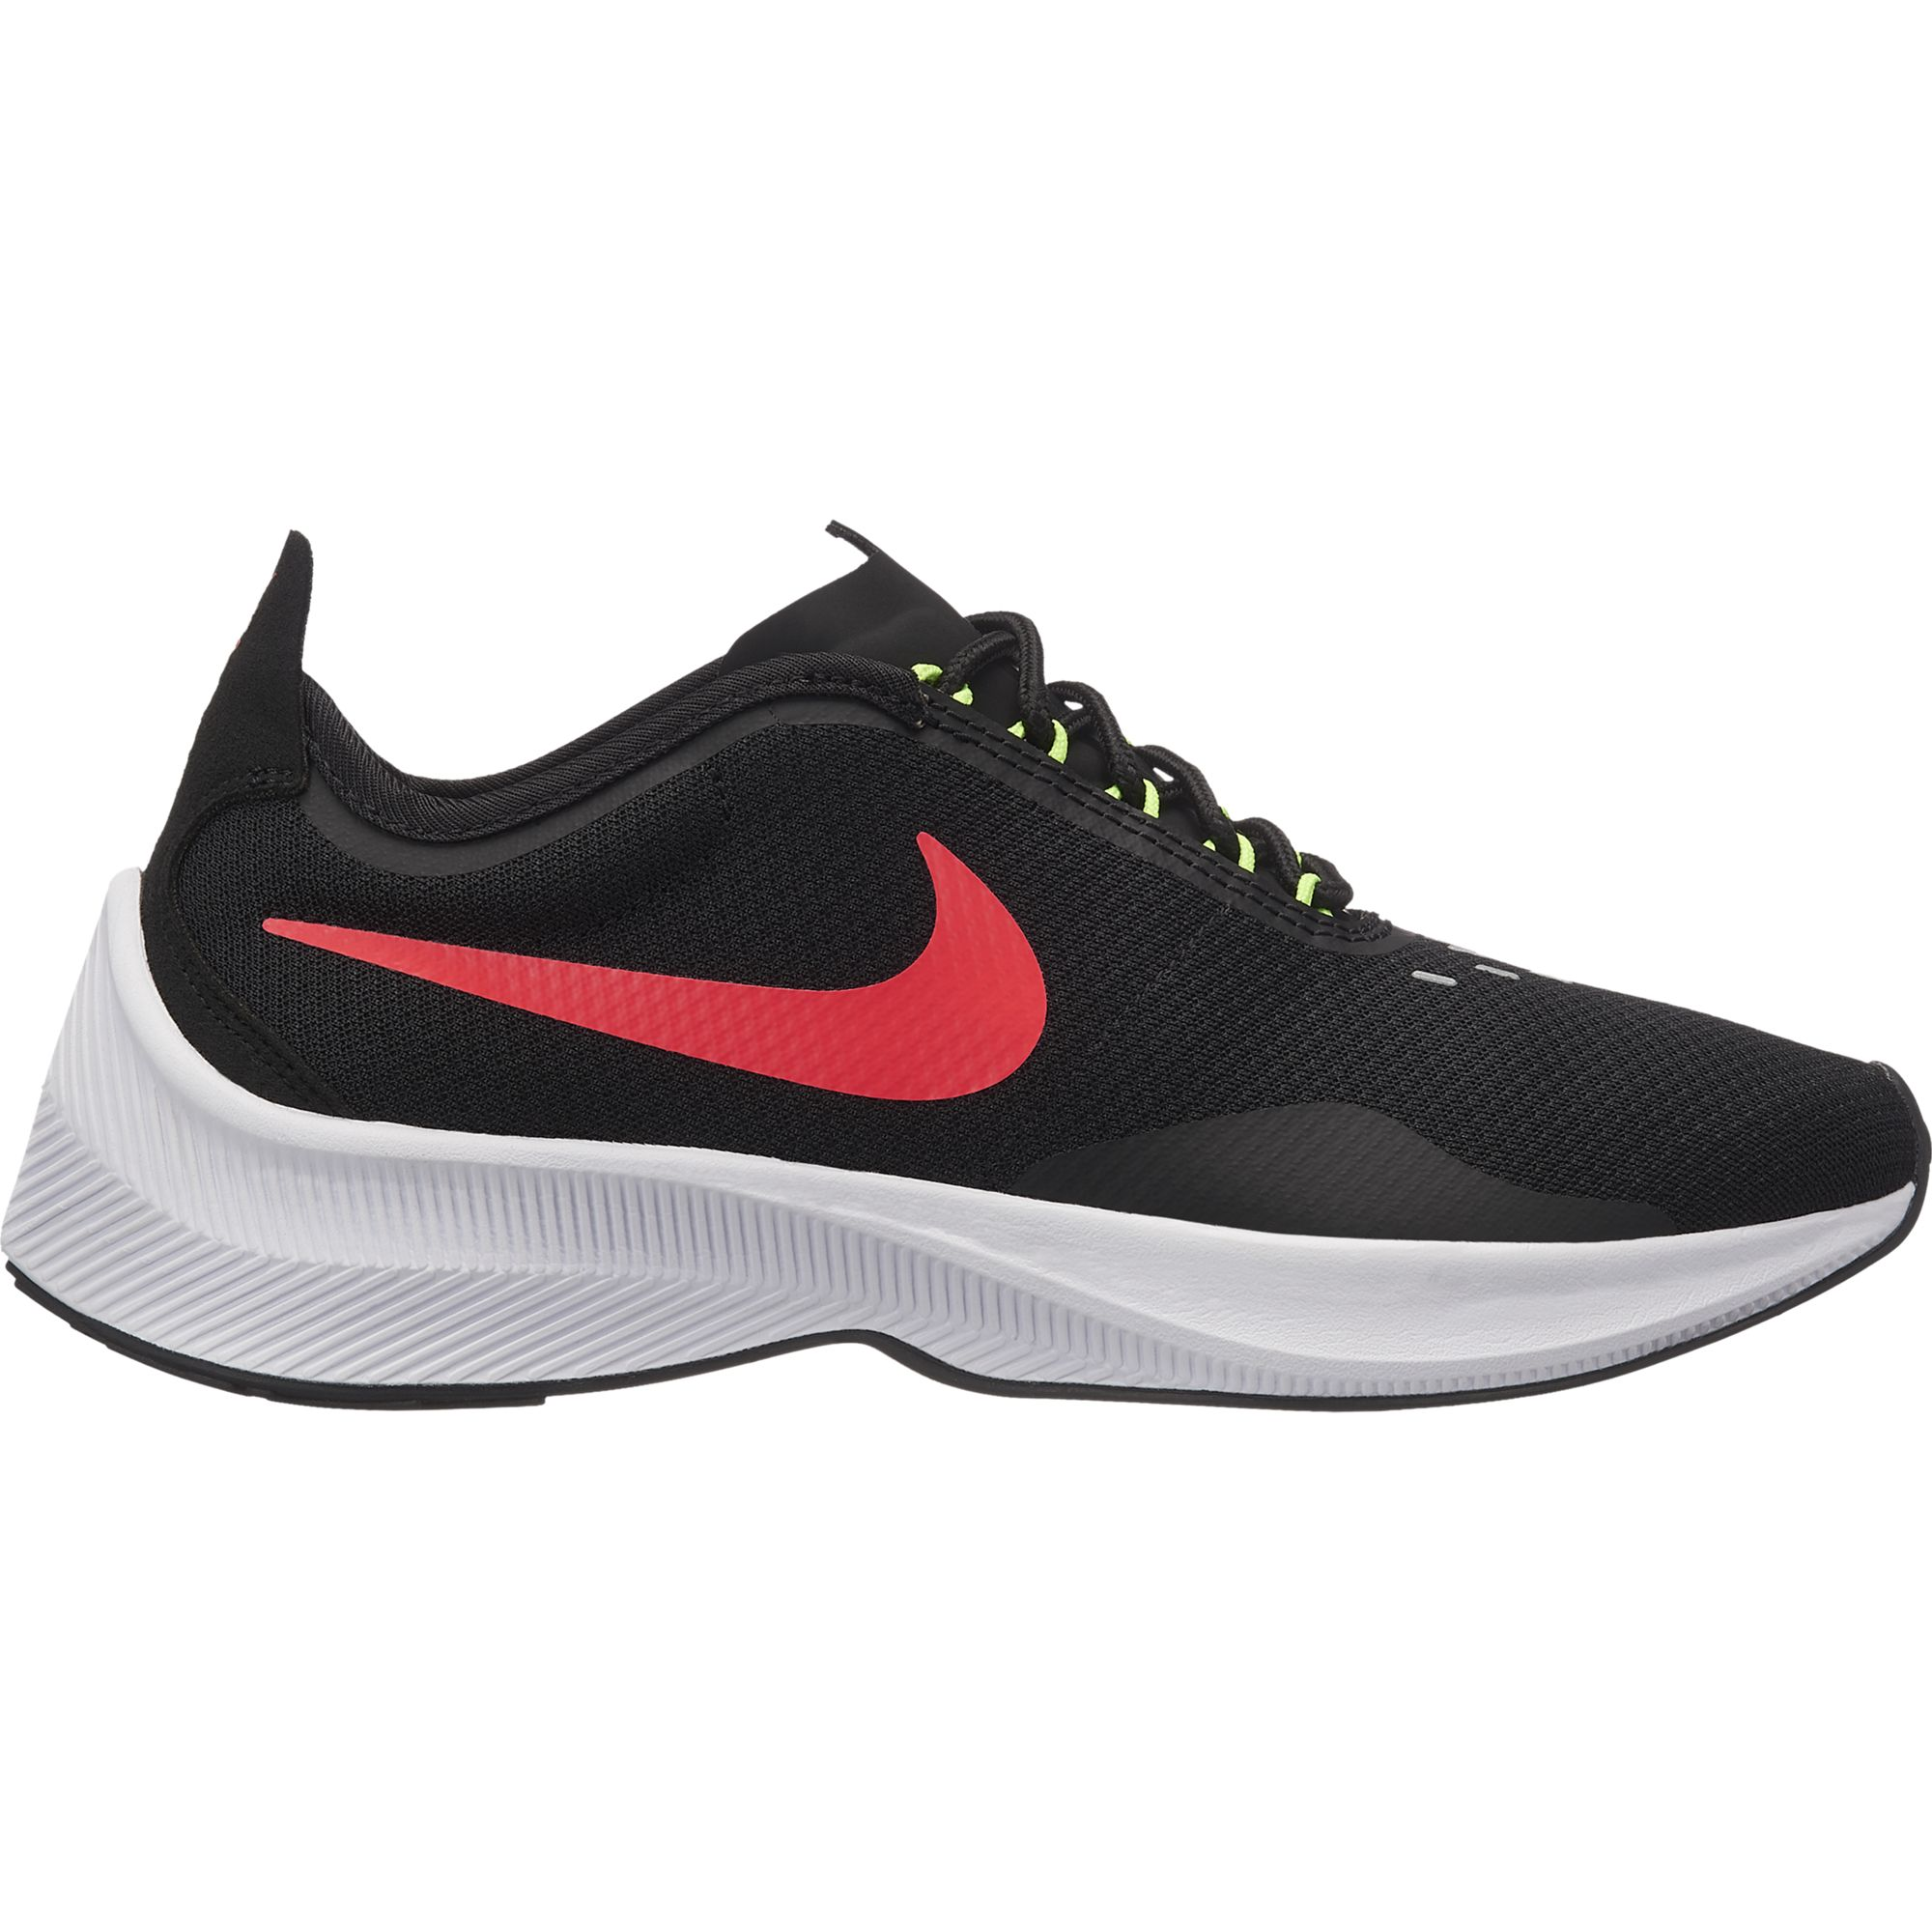 [ALPHA] NIKE EXP-Z07 AO1544-003 男鞋 運動休閒鞋